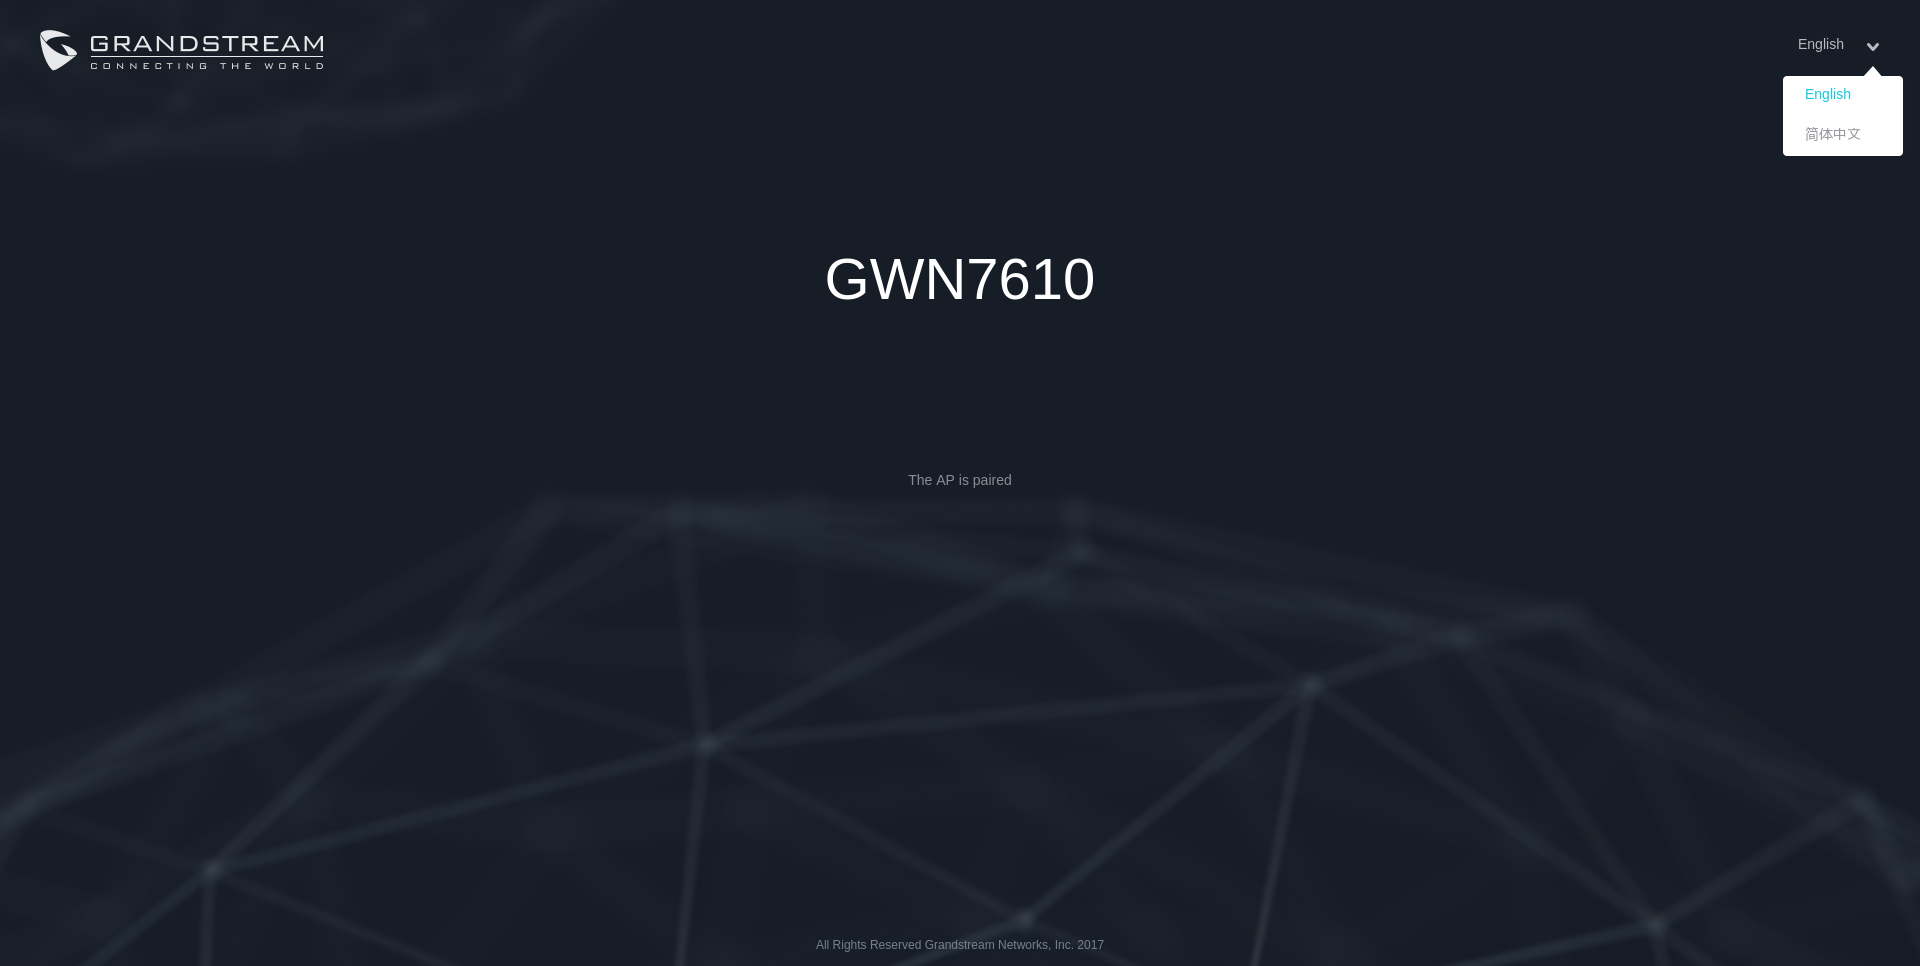 Обзор на wifi точки доступа Grandstream GWN7610 - 27